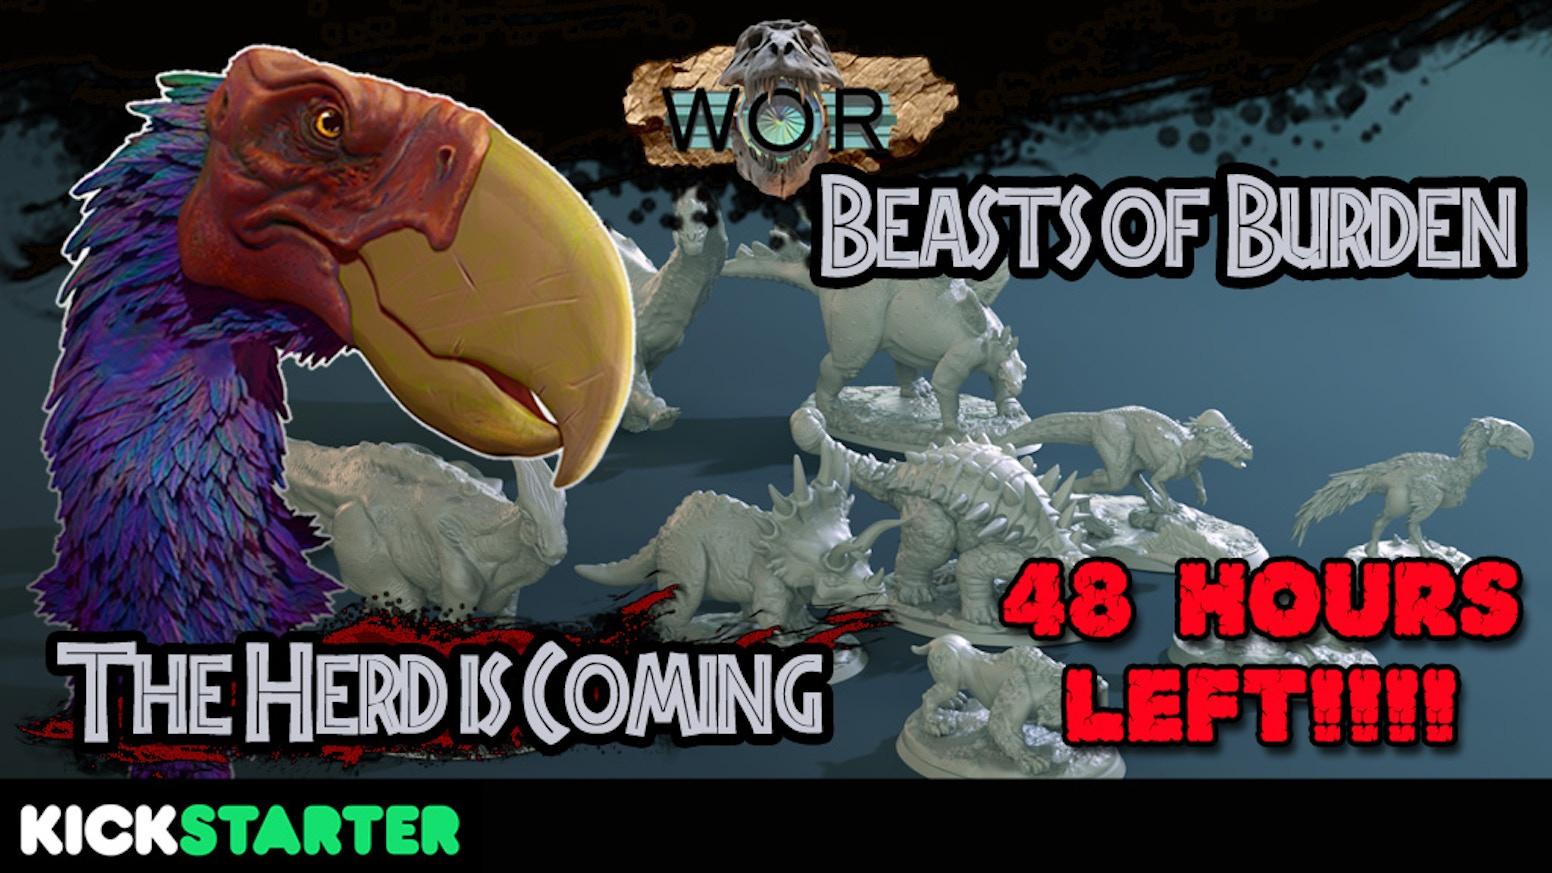 3D Printable, Terrain, Miniatures, Dinosaurs, 3D Printed Beasts, 3D Printing, Prehistoric, STL, ZBrush and more!!!